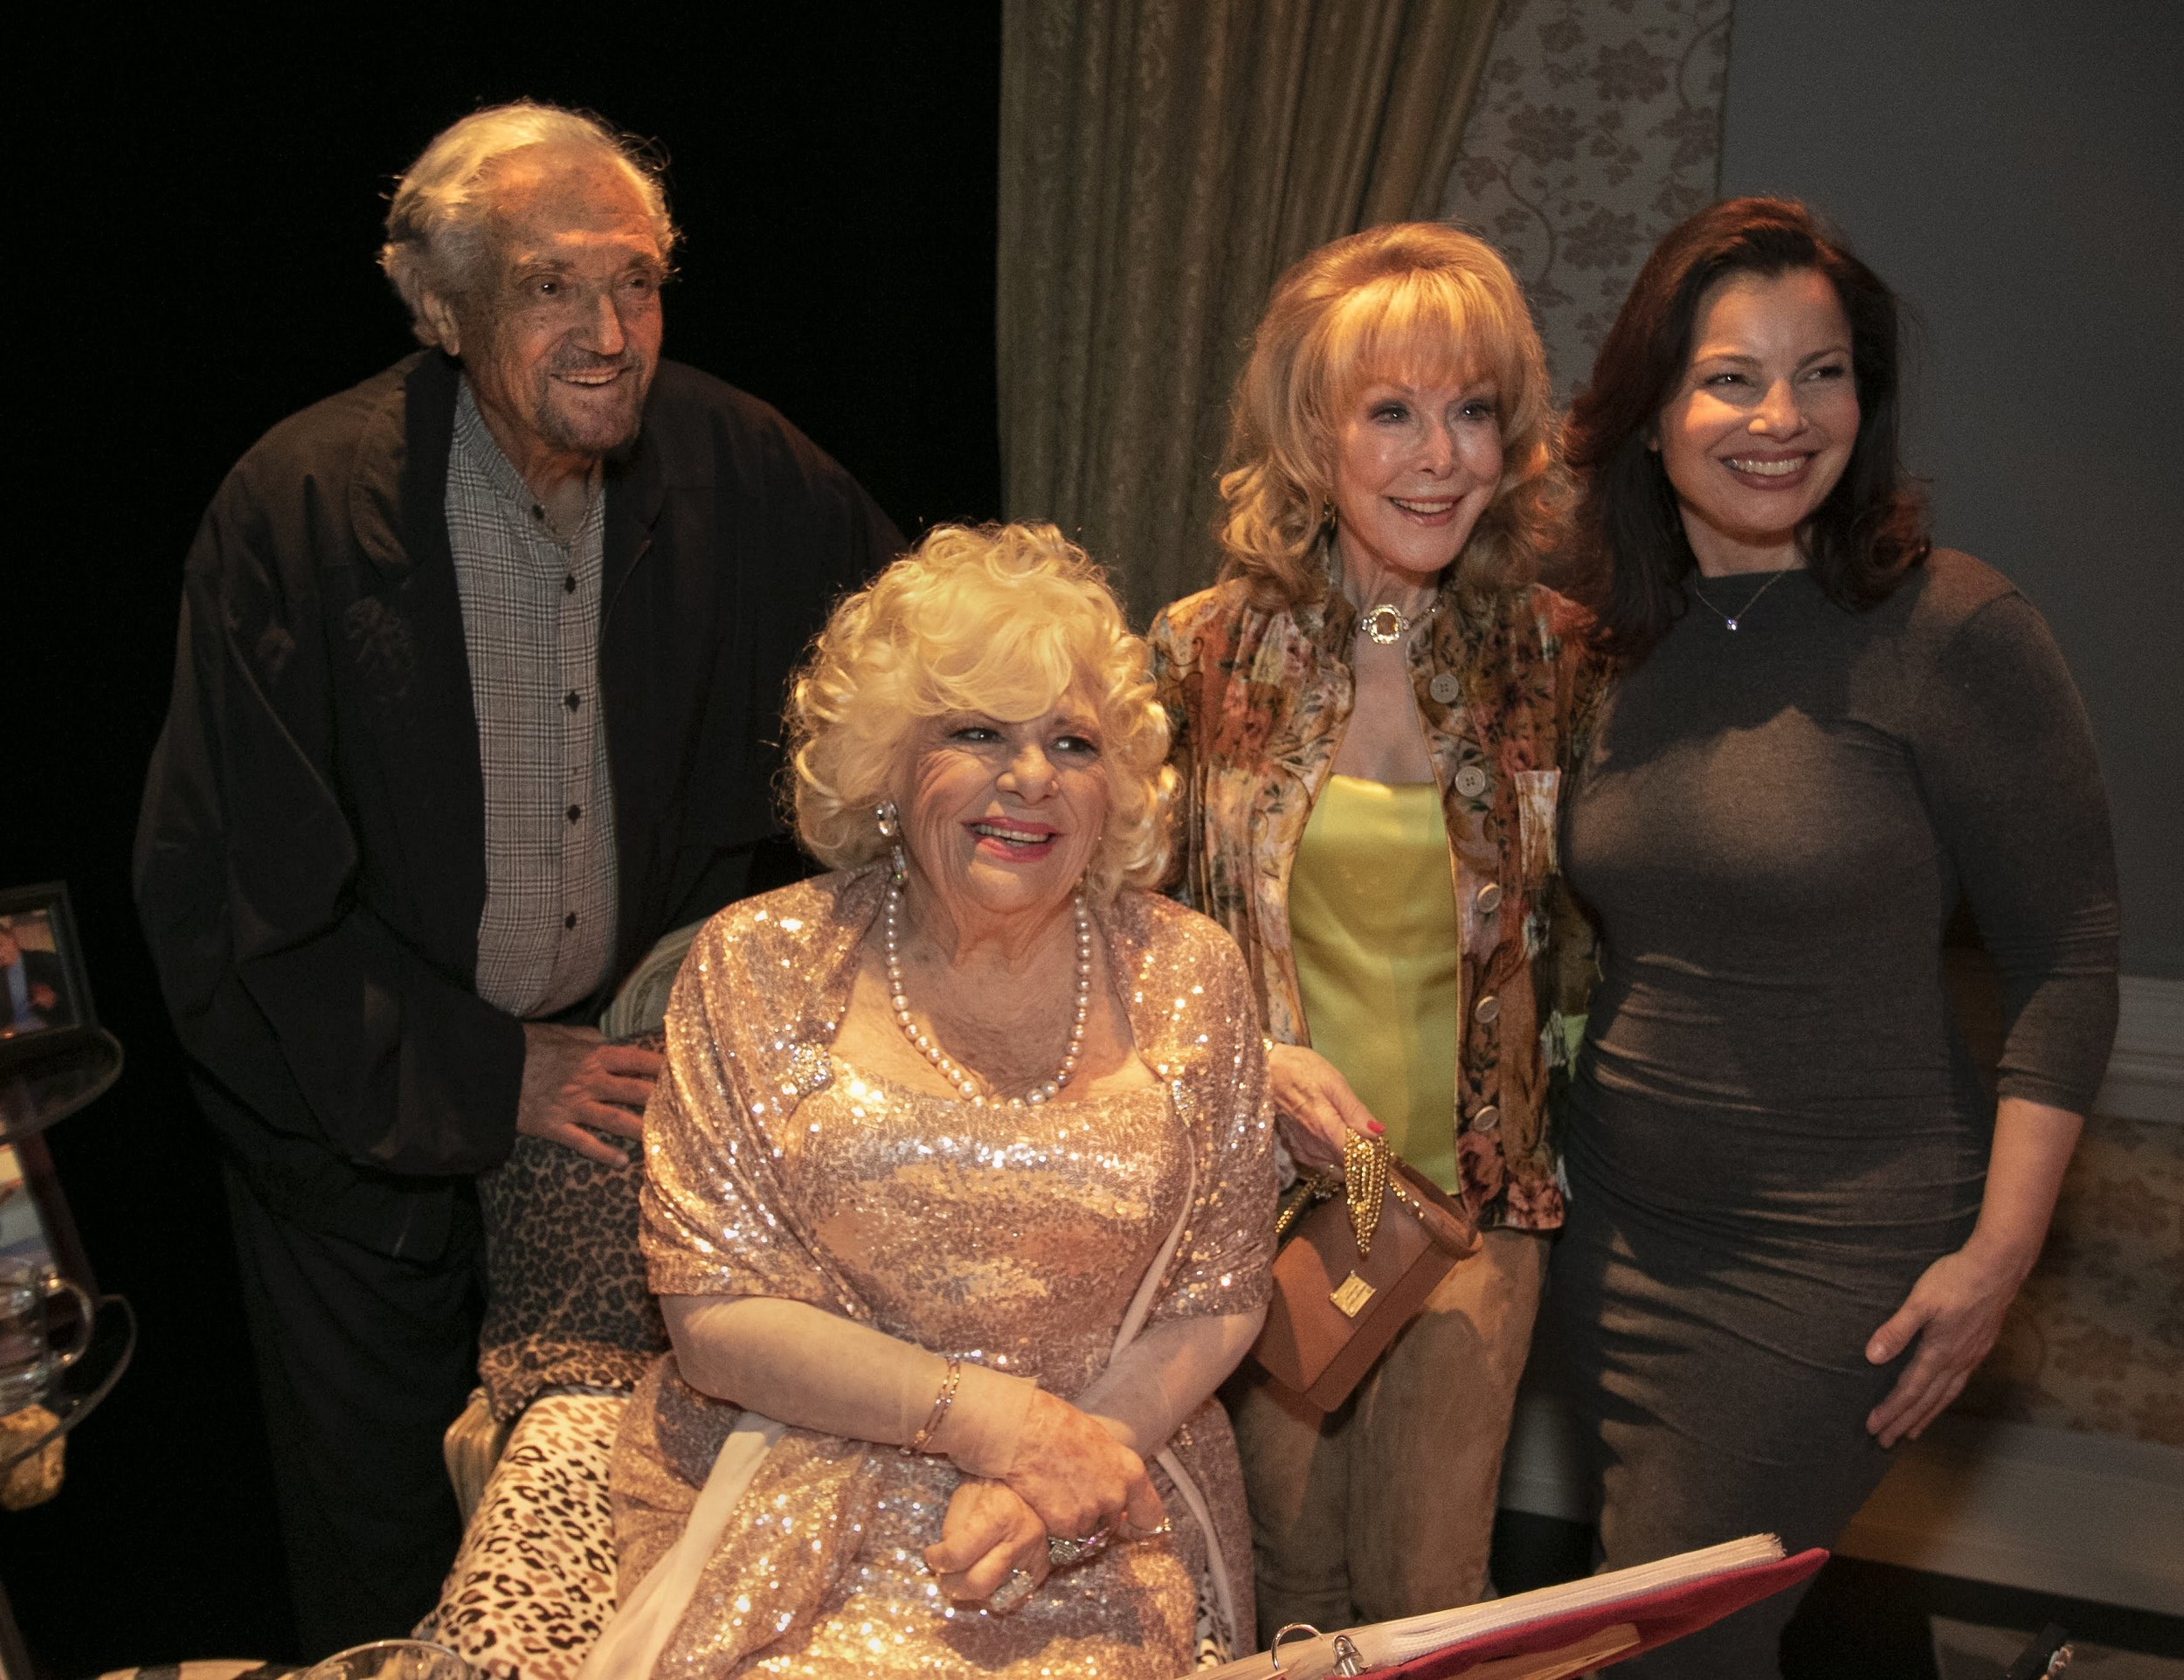 Hal Linden, Renée Taylor, Barbara Eden and Fran Drescher